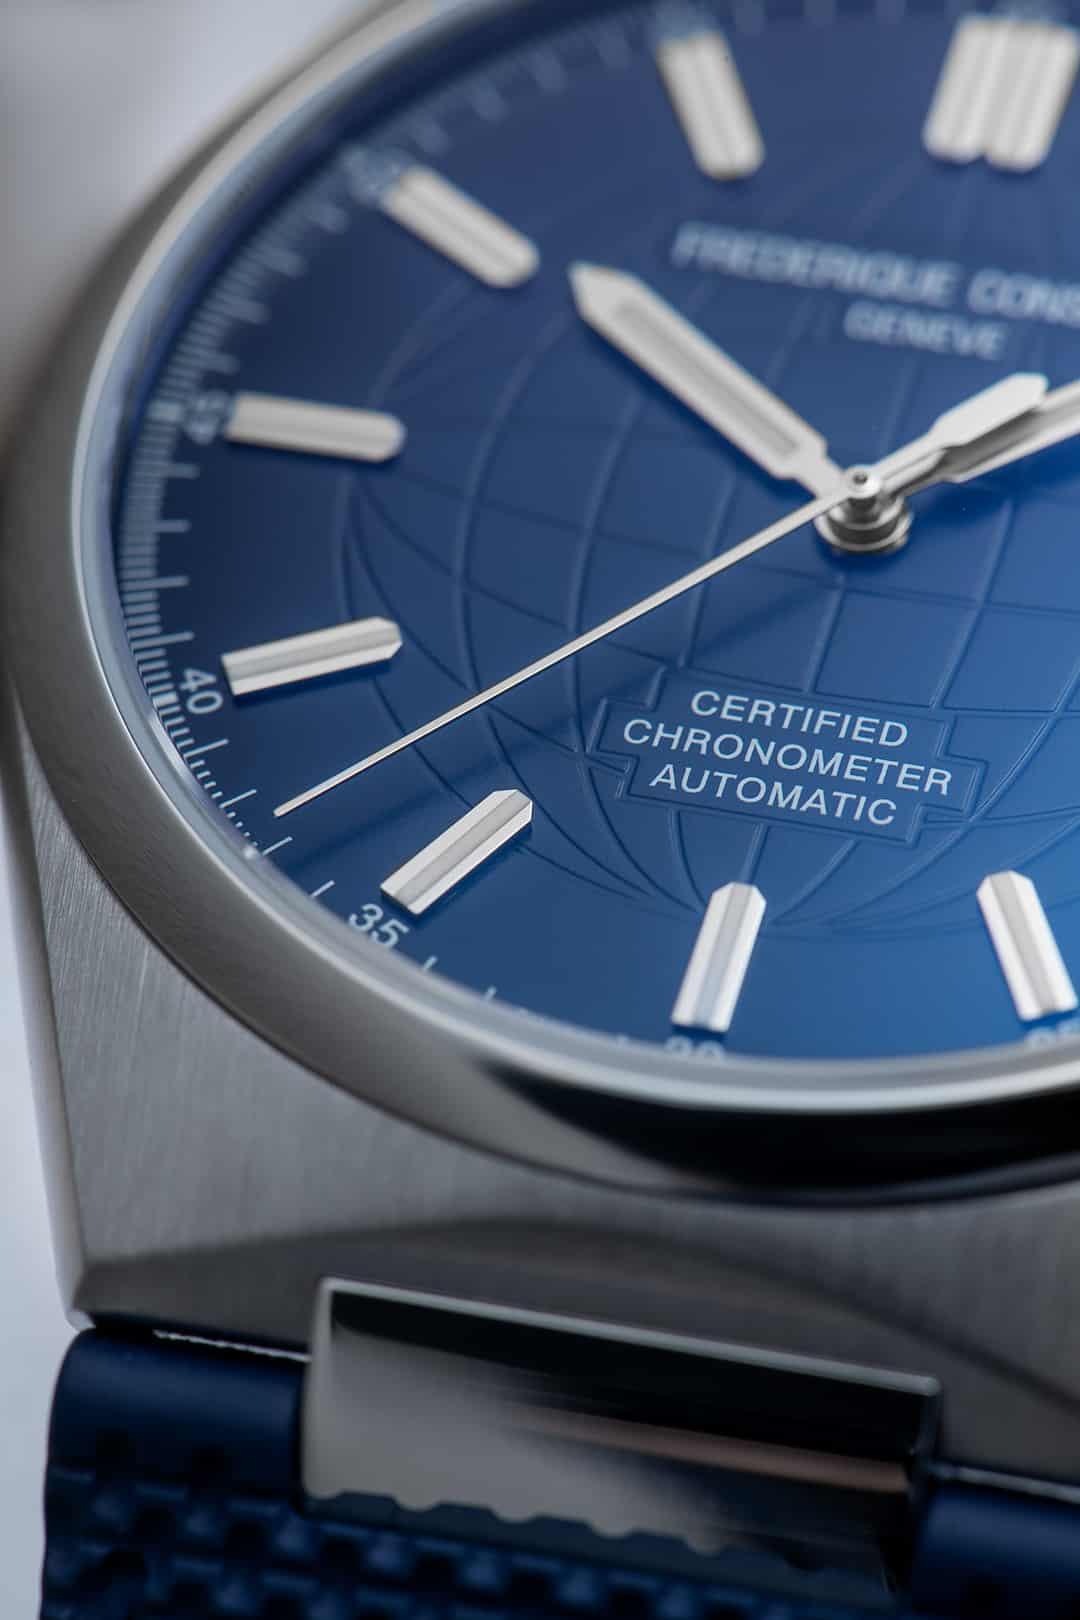 COSC zertifizierte Chronometer von Frederique Constant